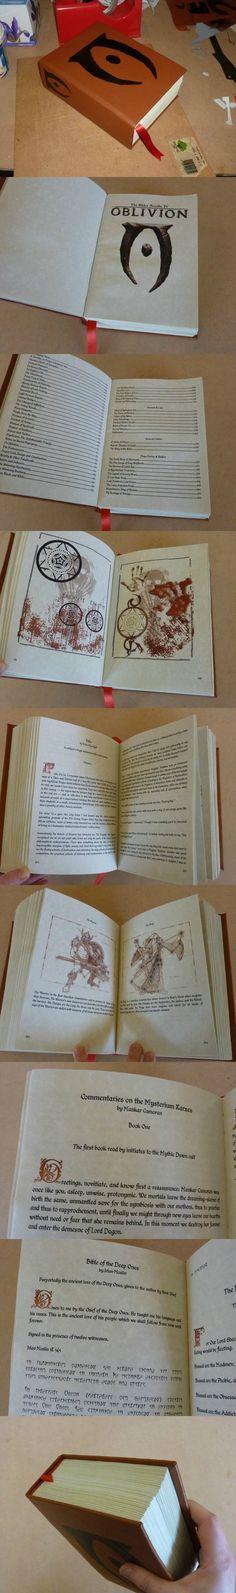 Oblivion books only Elder Scrolls Fans would get this